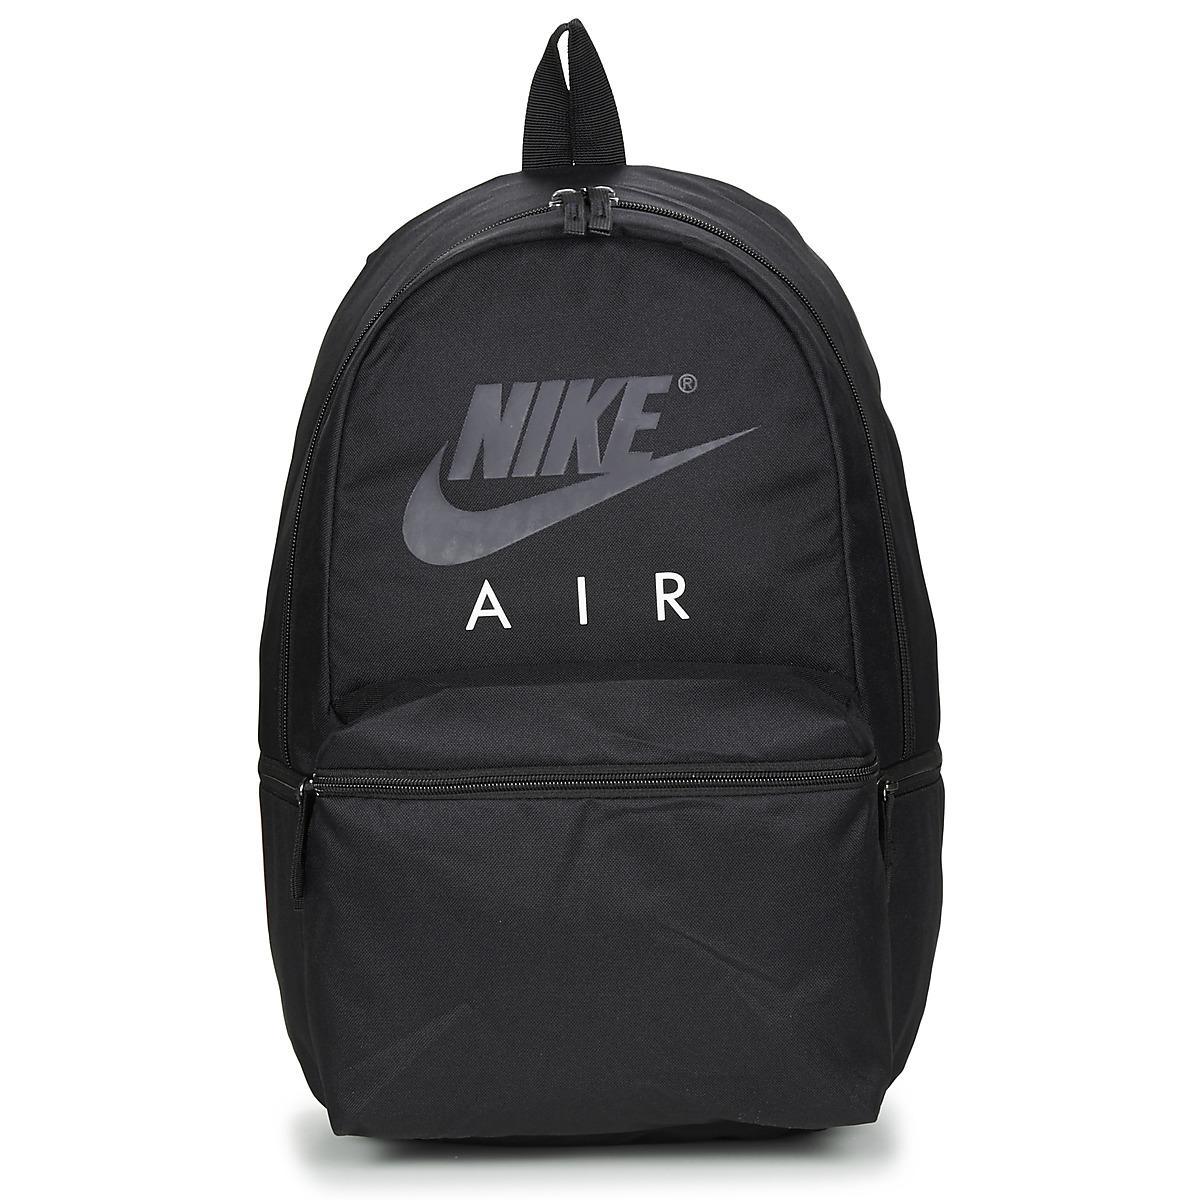 45c5a2c16146 Nike Air Men s Backpack In Black in Black for Men - Lyst